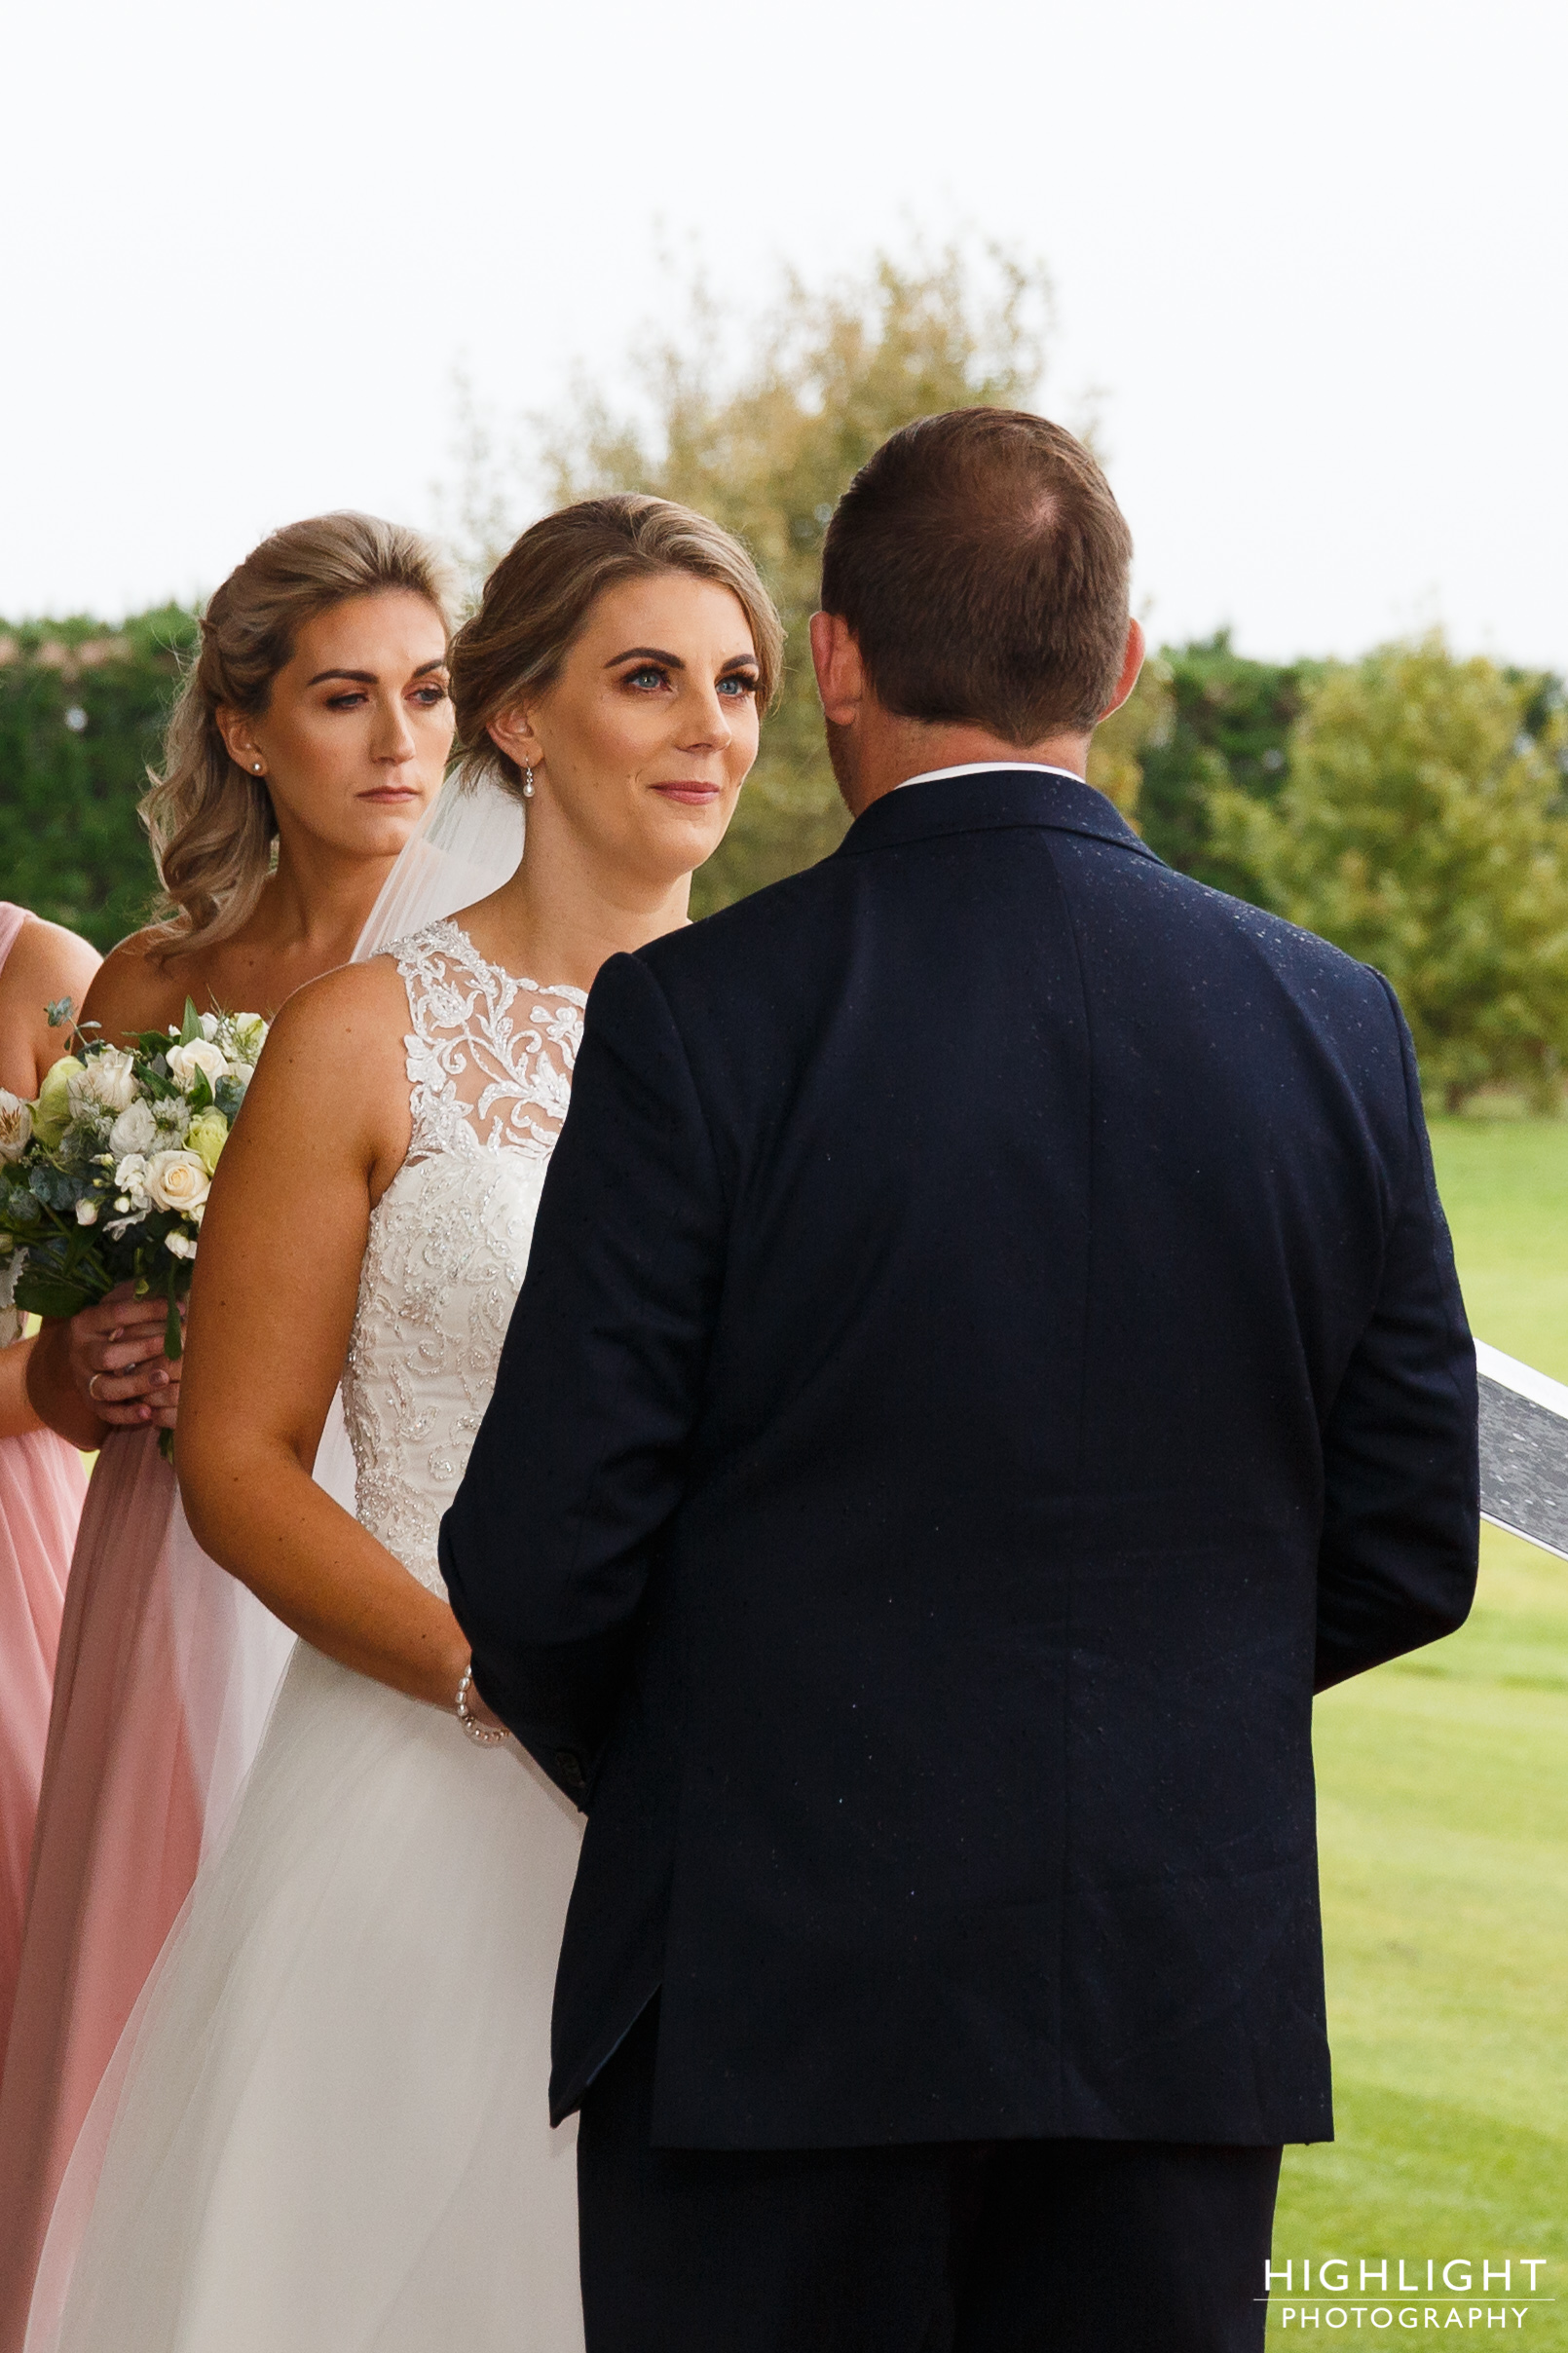 highlight-wedding-photography-palmerston-north-new-zealand-orlando-country-club-wedding-85.jpg